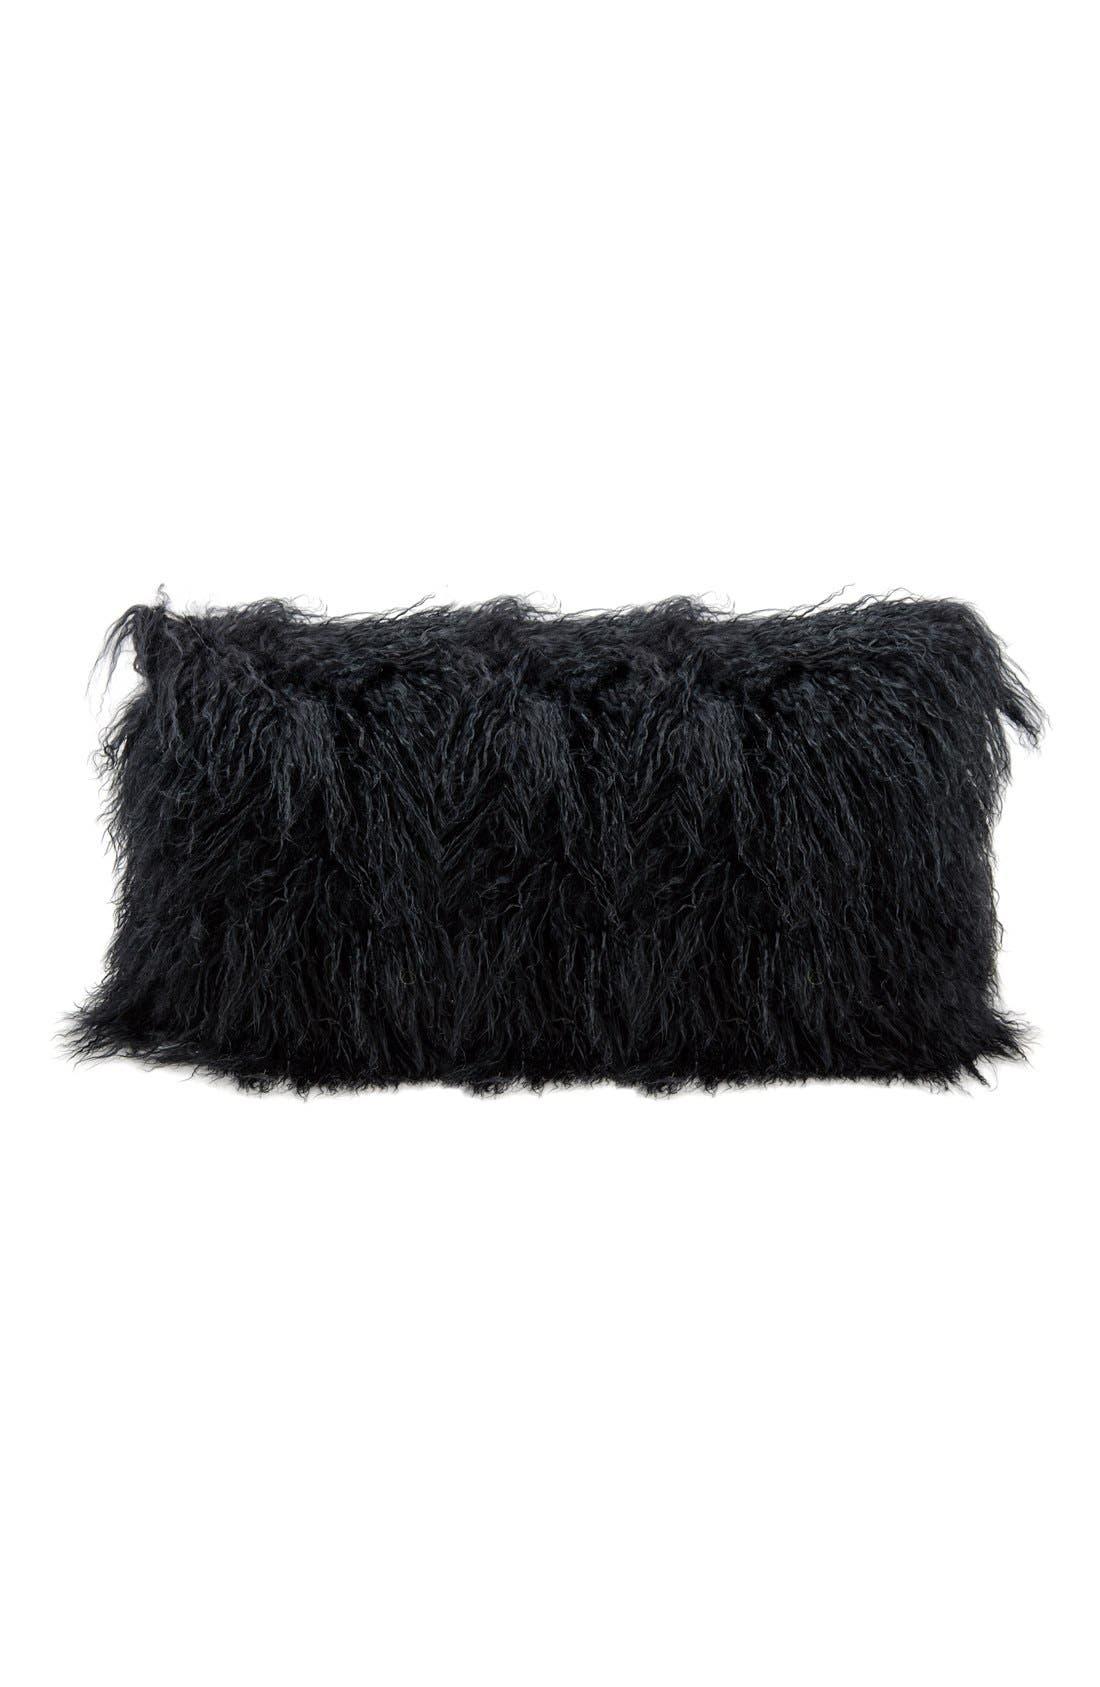 MINA VICTORY Genuine Tibetan Shearling Pillow